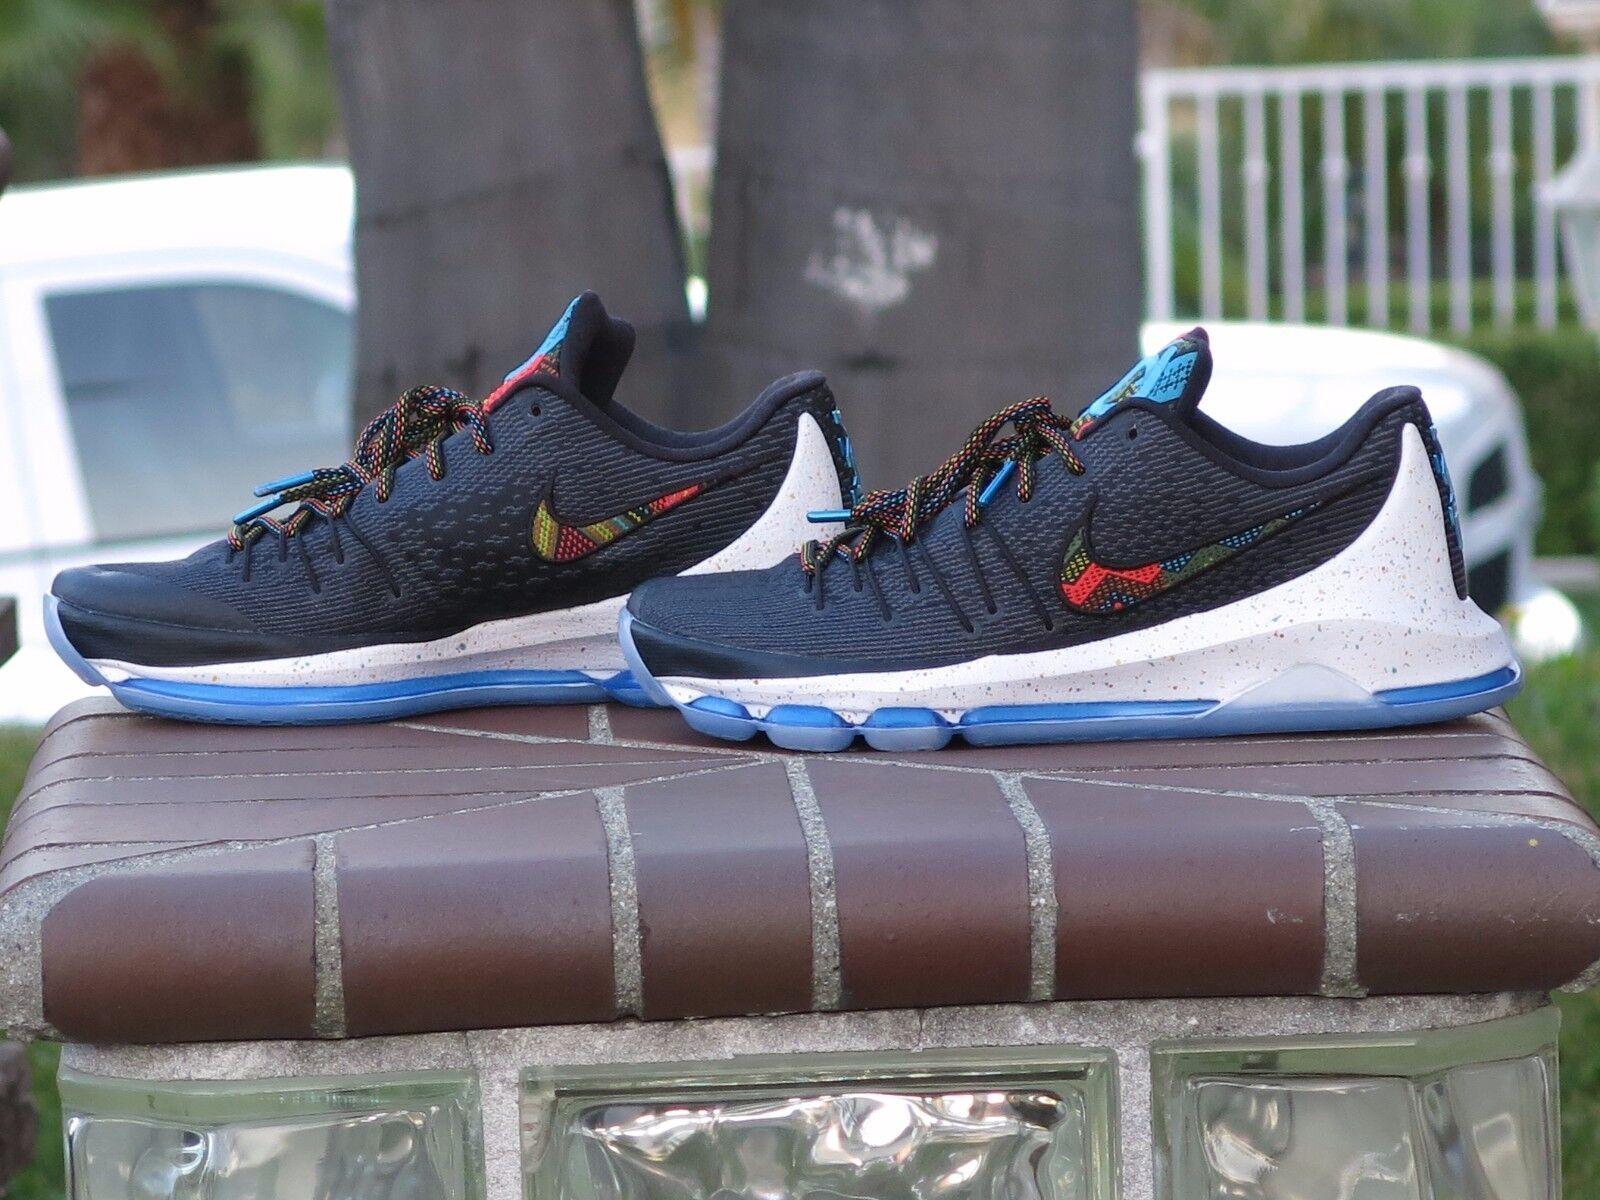 4db1409eacdb ... Nike KD 8 VIII Black History Month Month Month Men s Basketball Shoes  824420-090 SZ ...